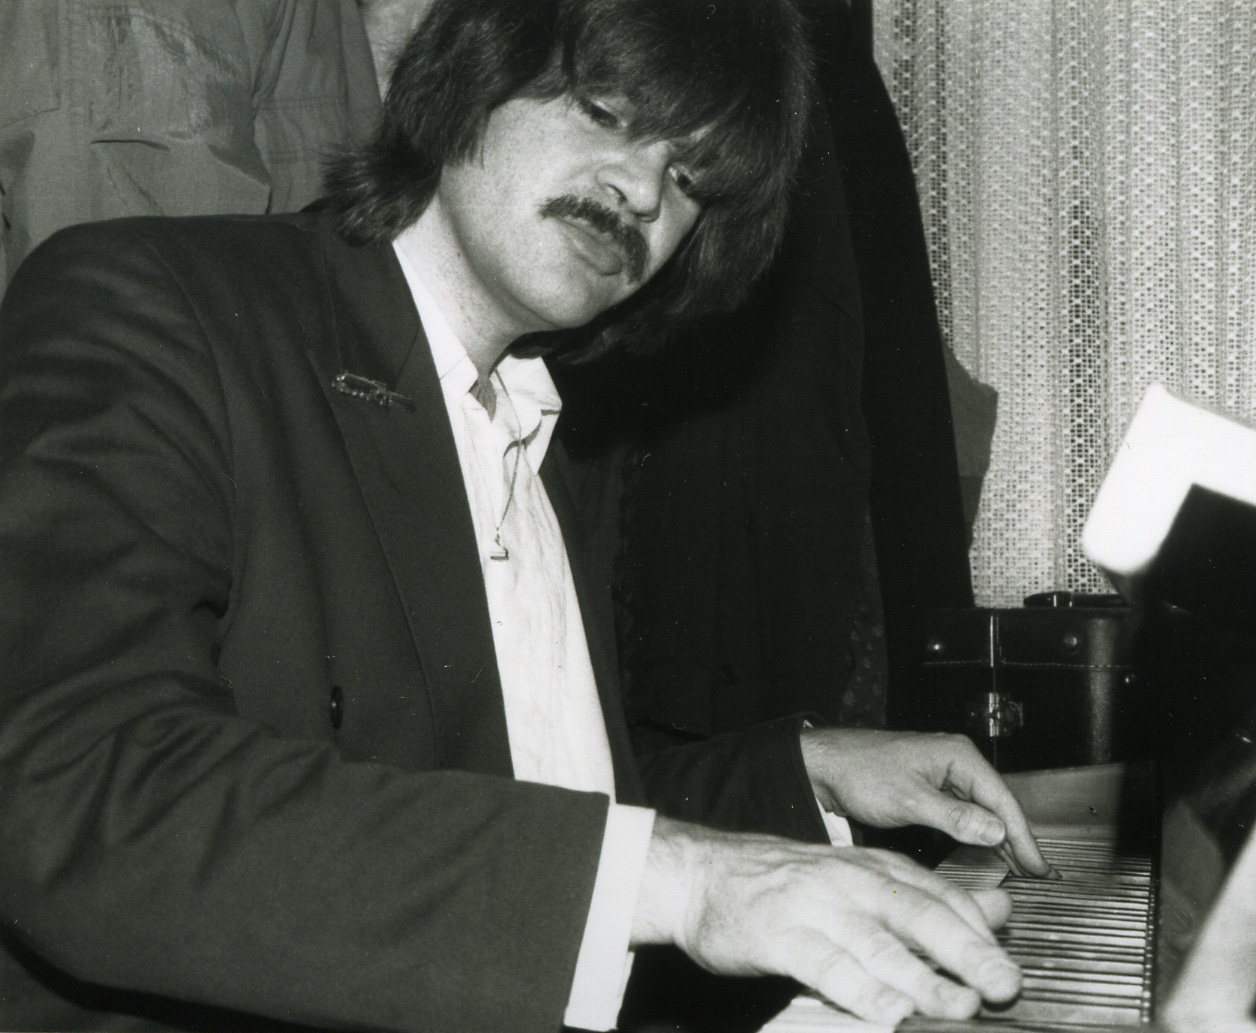 Axel Zwingenberger